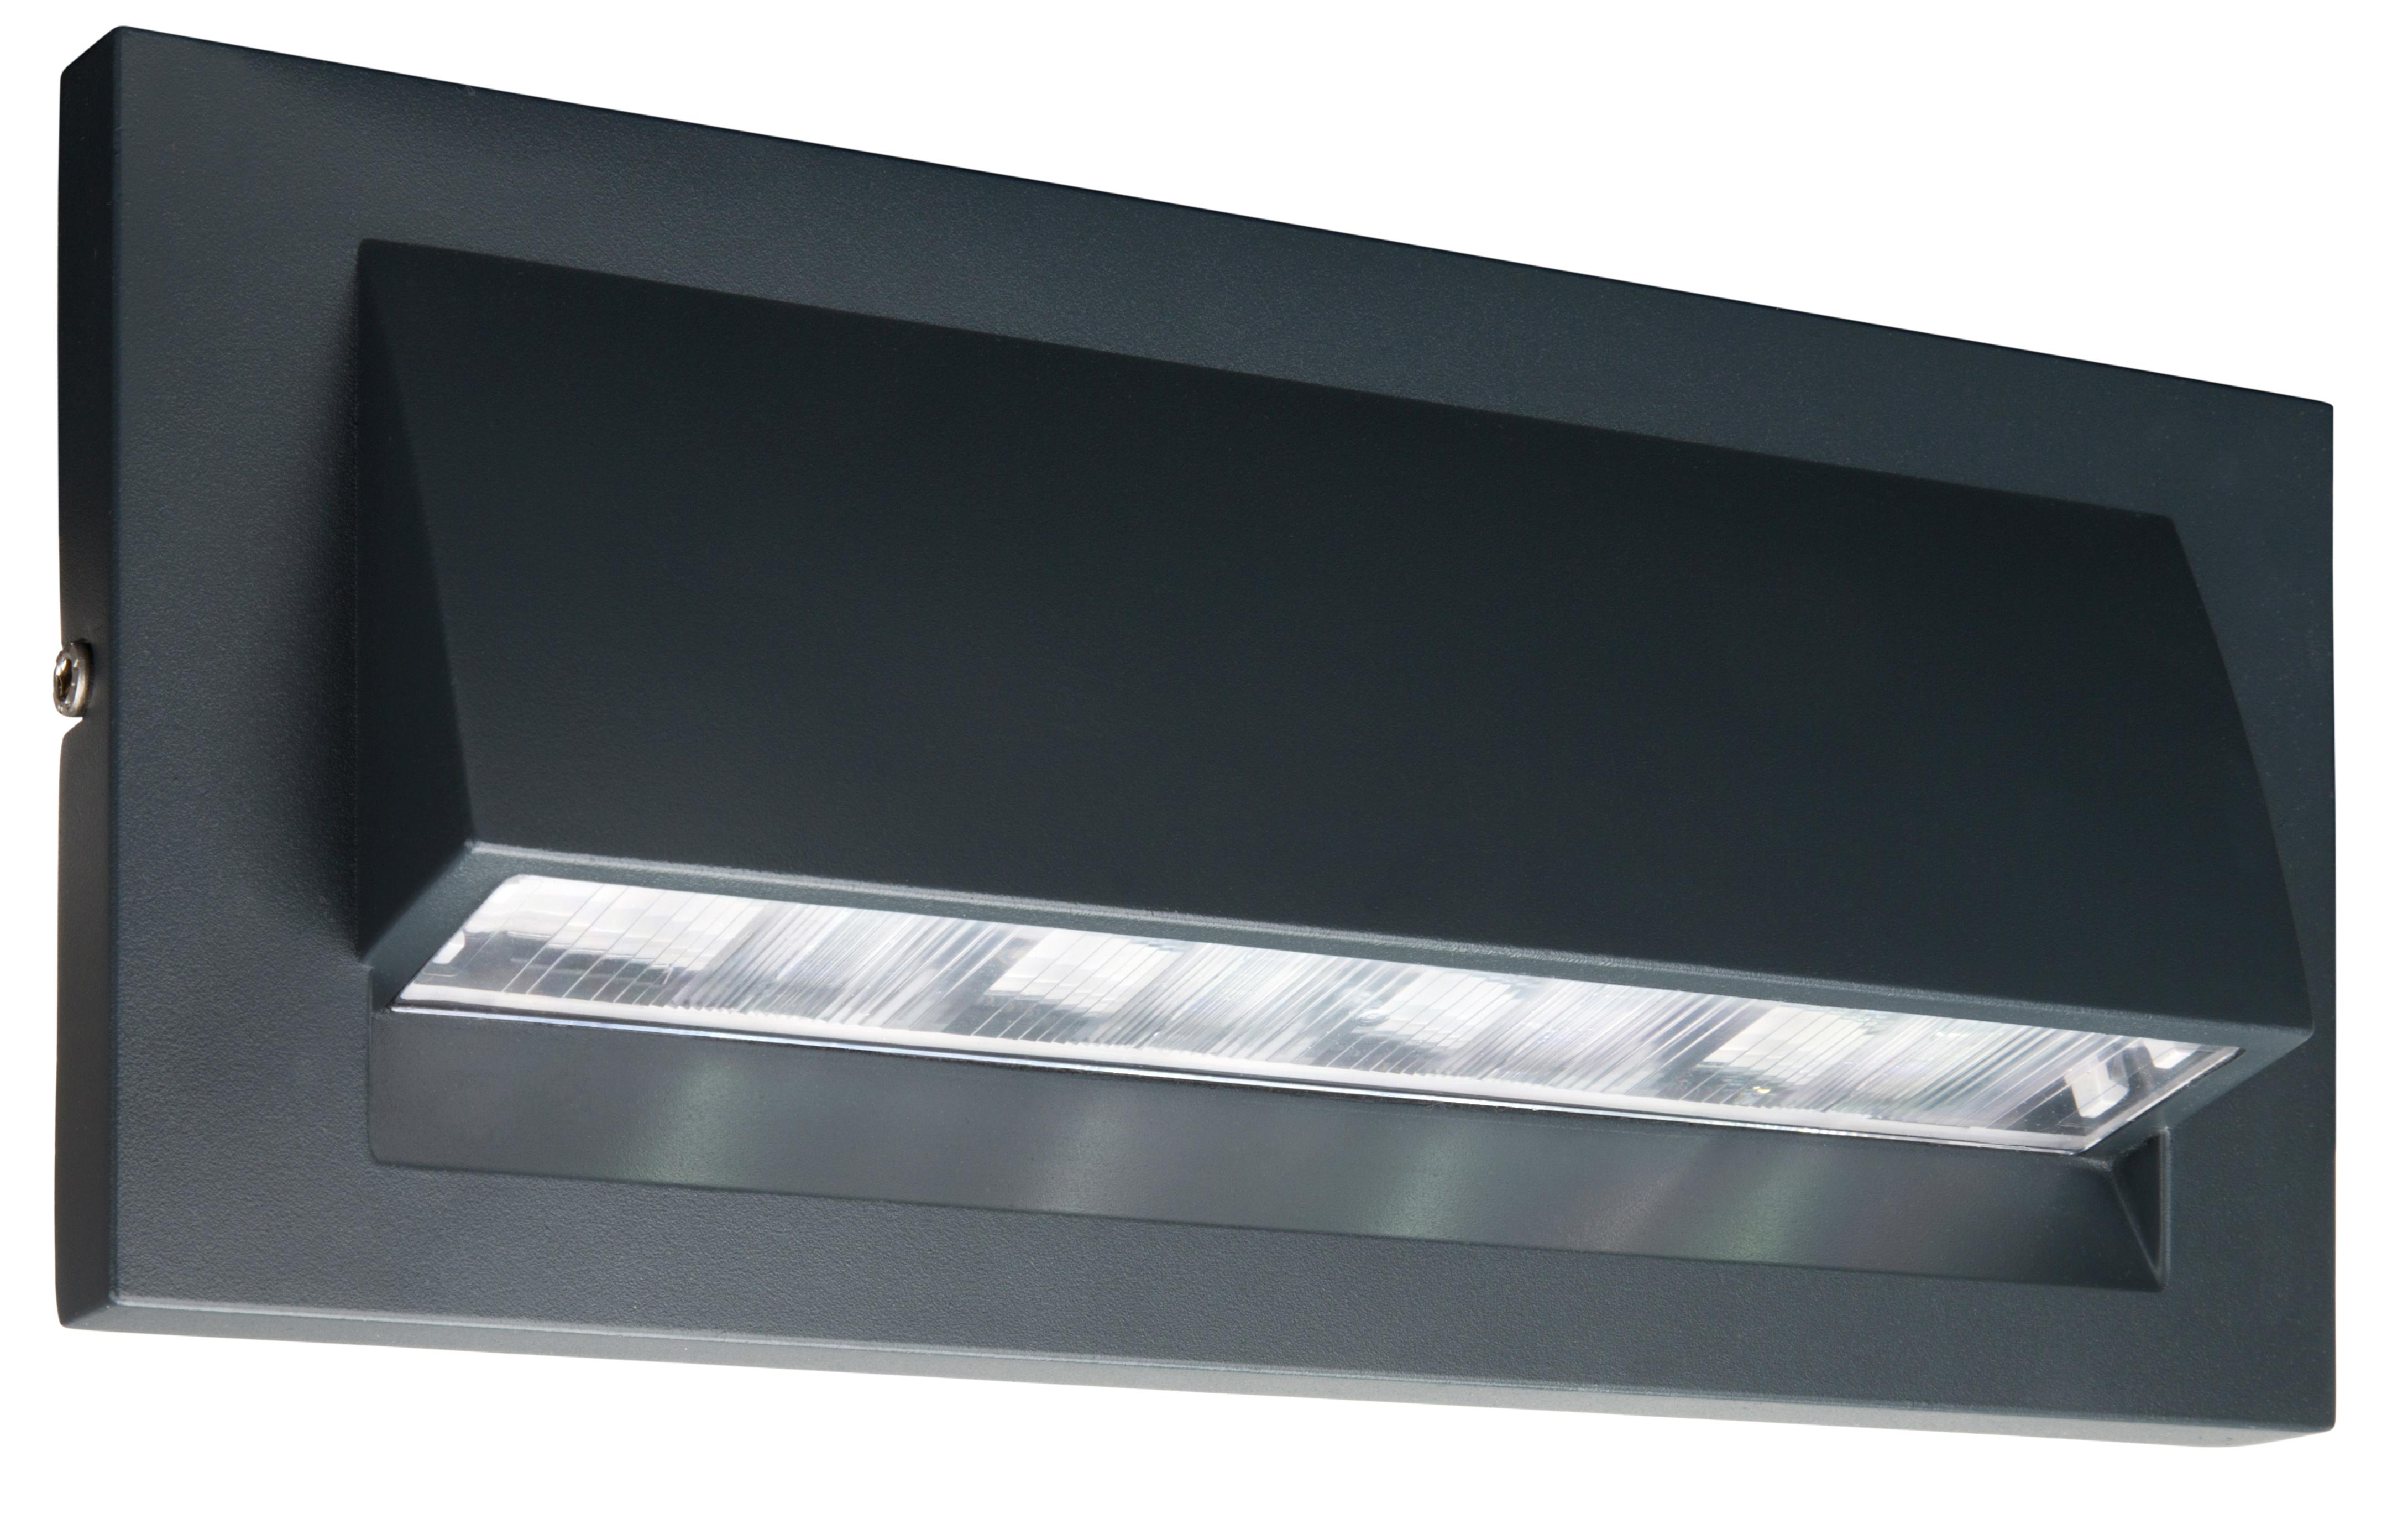 1 Stk Notleuchte ZAA LED 4 x HP LED 0,5W 230V EL, Wandanbaumontage NLZAA009EL